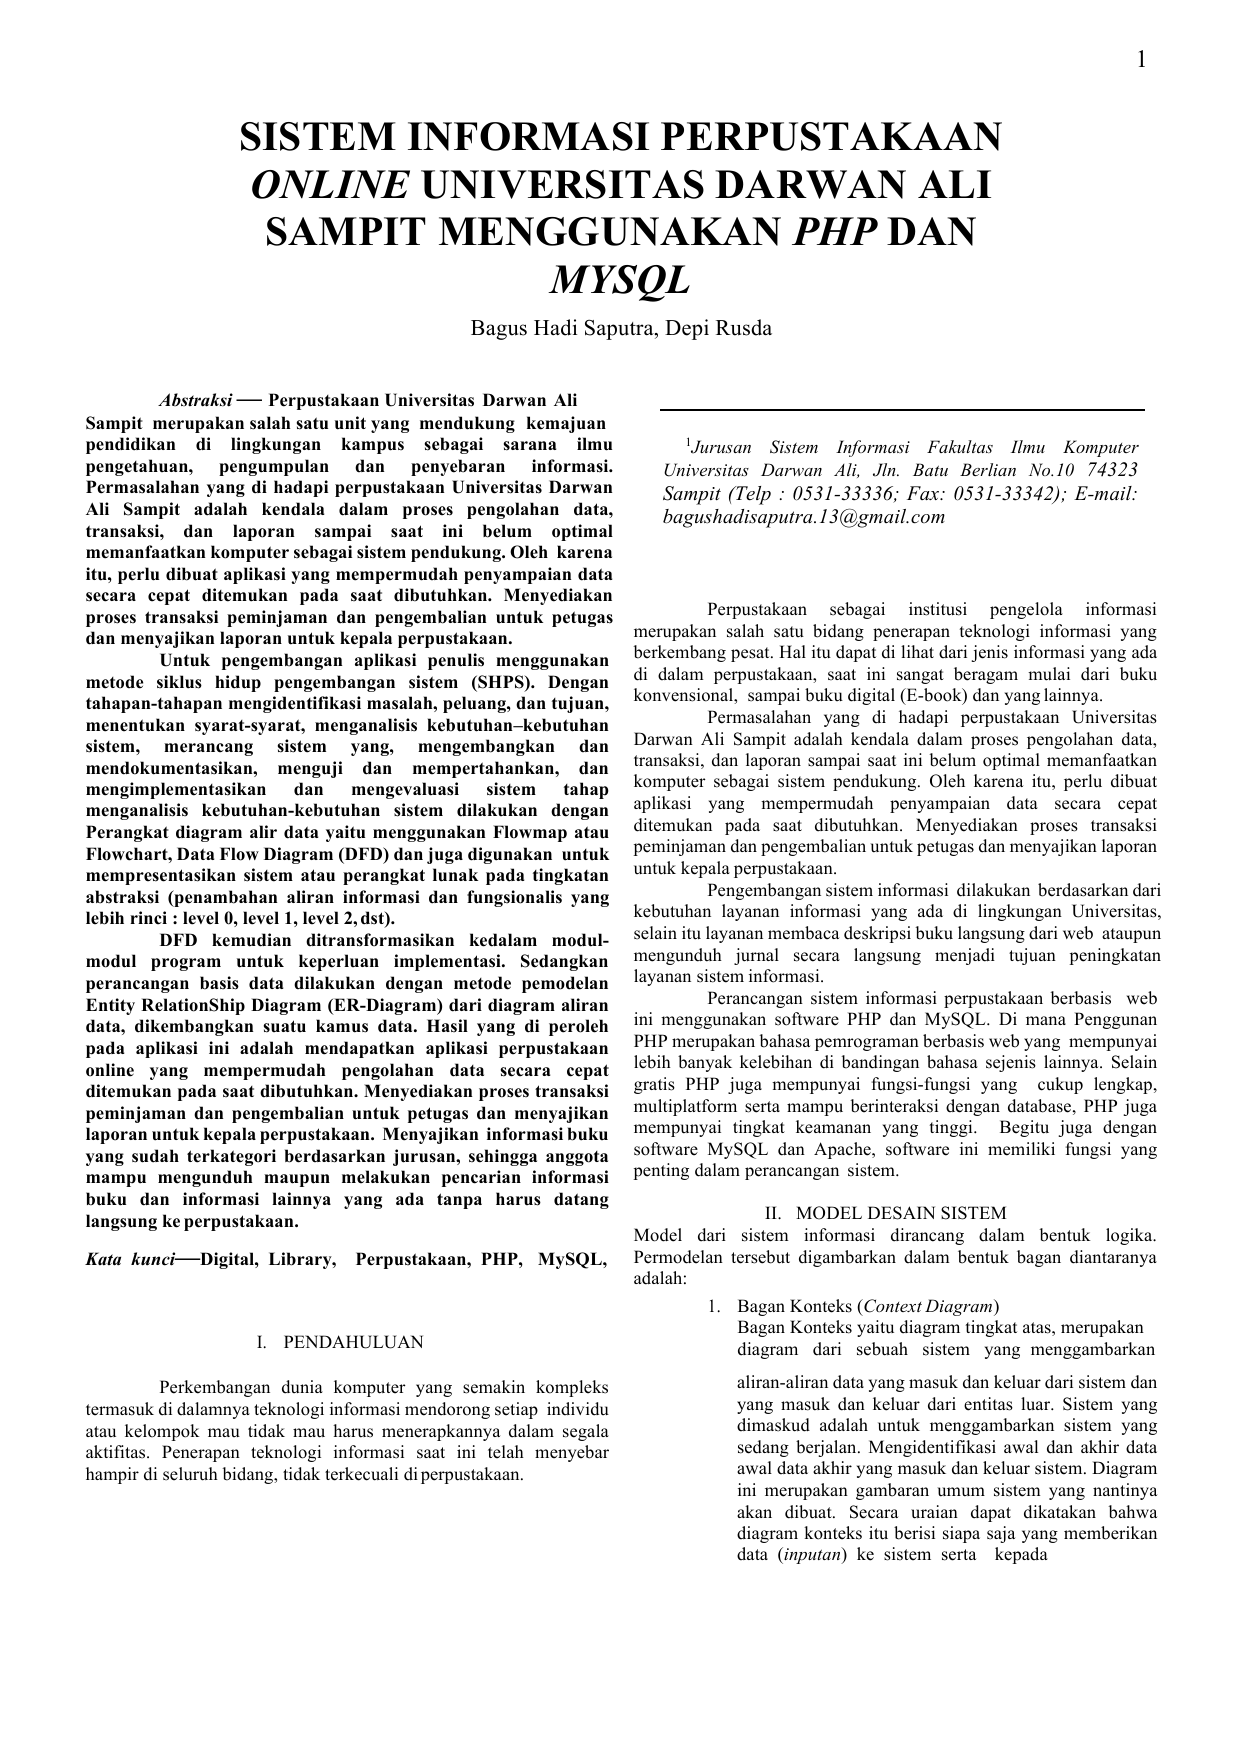 Sistem informasi perpustakaan online universitas darwan ali sampit ccuart Image collections